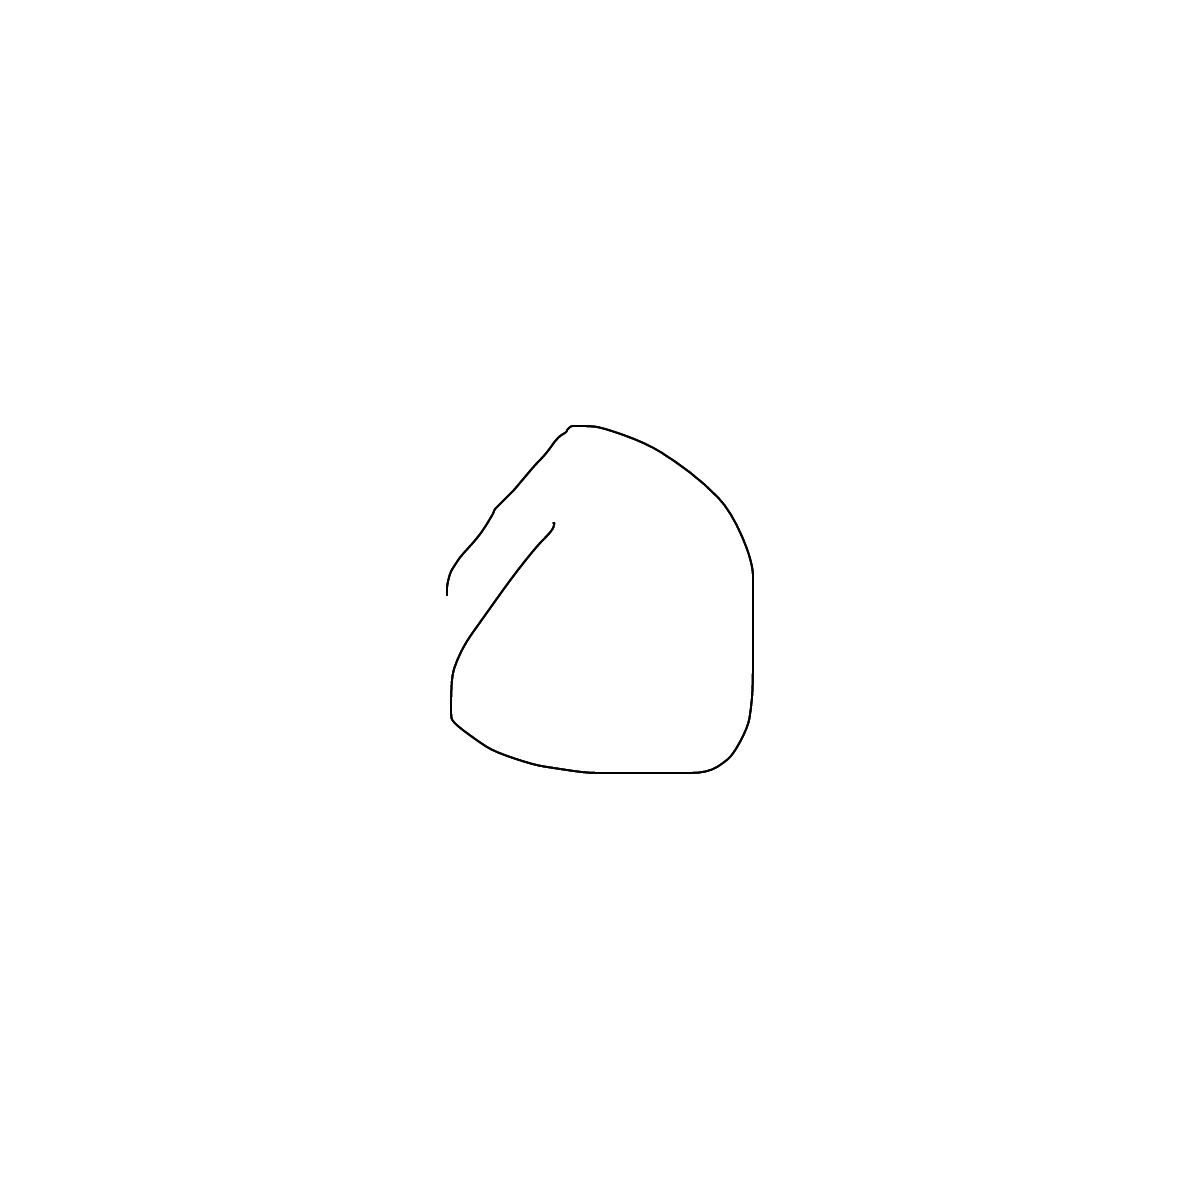 BAAAM drawing#24288 lat:57.9757537841796900lng: 56.2347335815429700